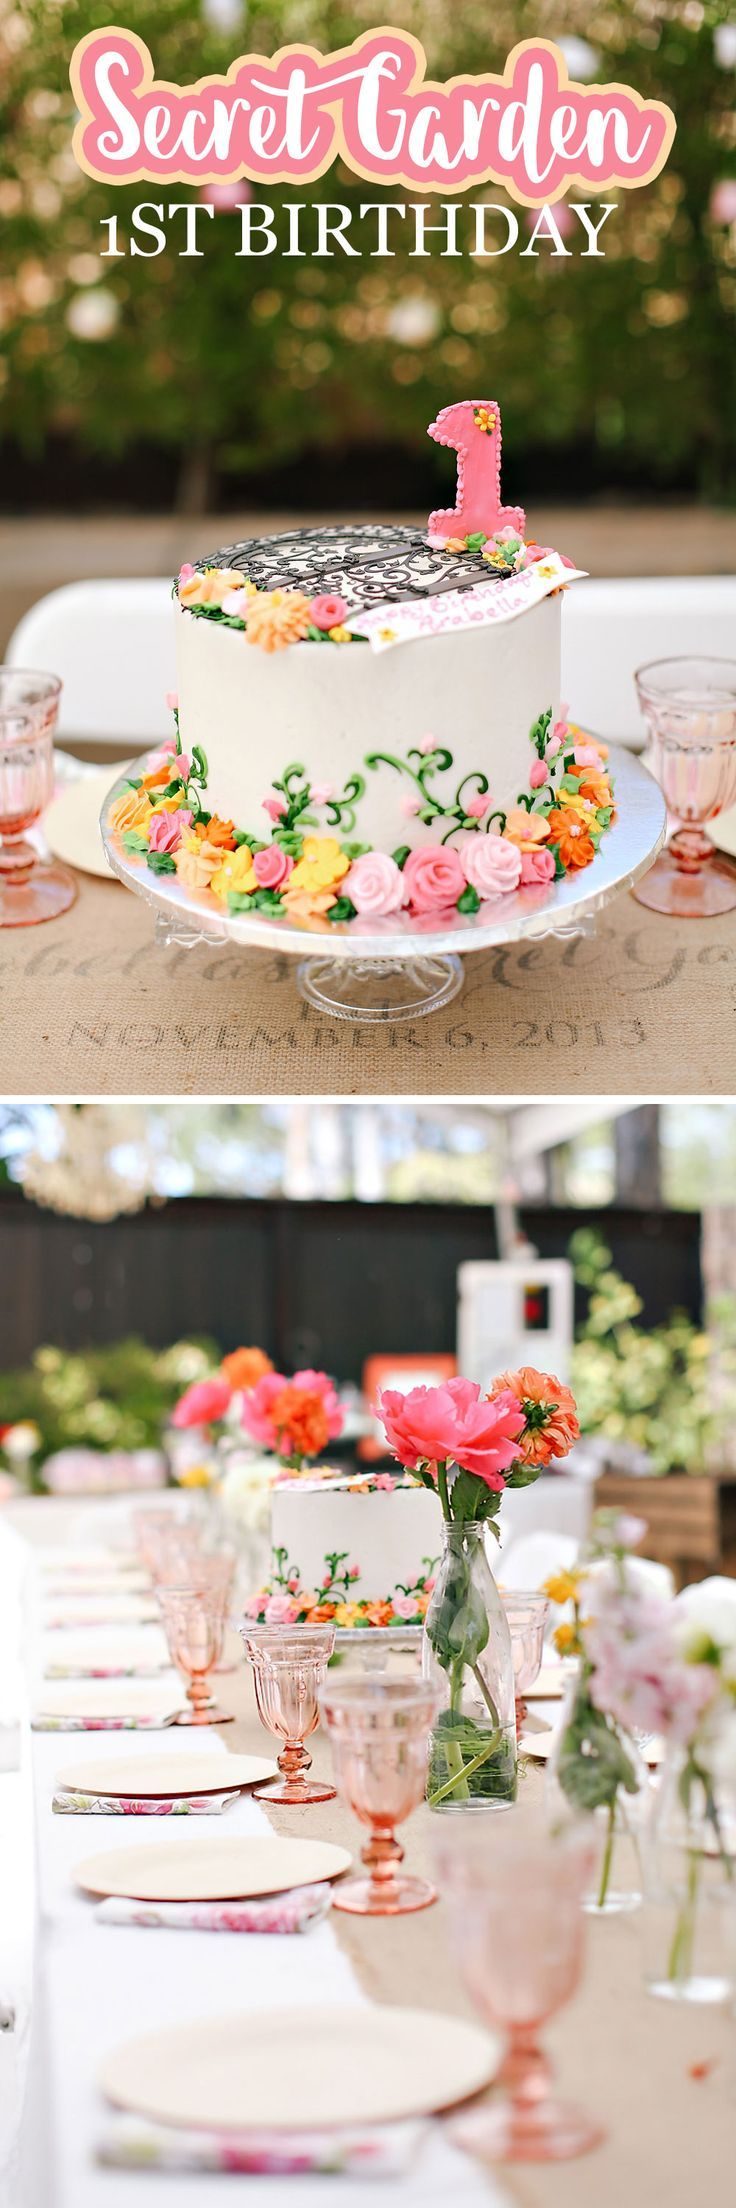 A Secret Garden Themed 1st Birthday First Birthday Party